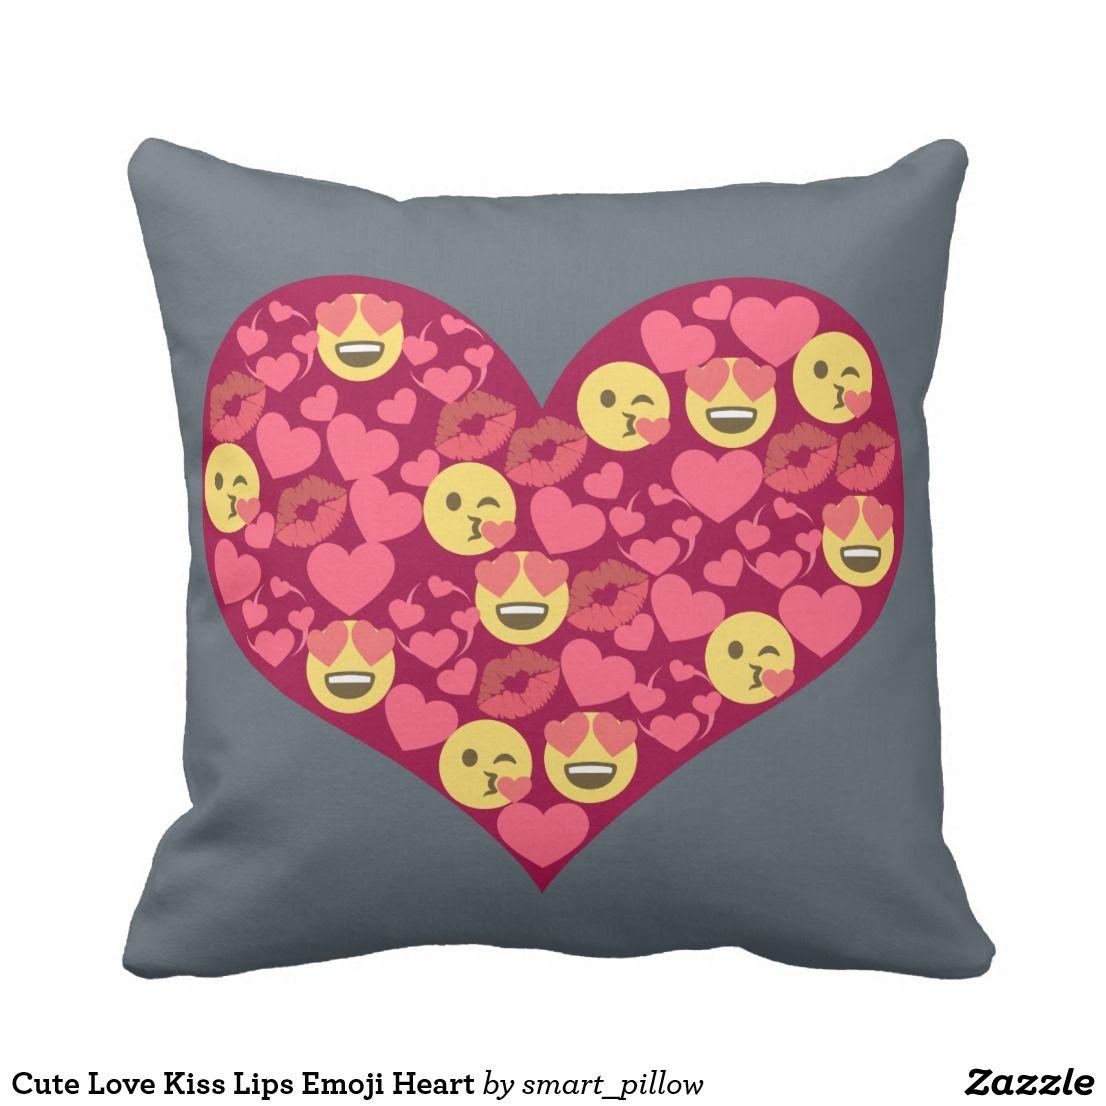 Cute Love Kiss Lips Emoji Heart Throw Pillow   Zazzle com